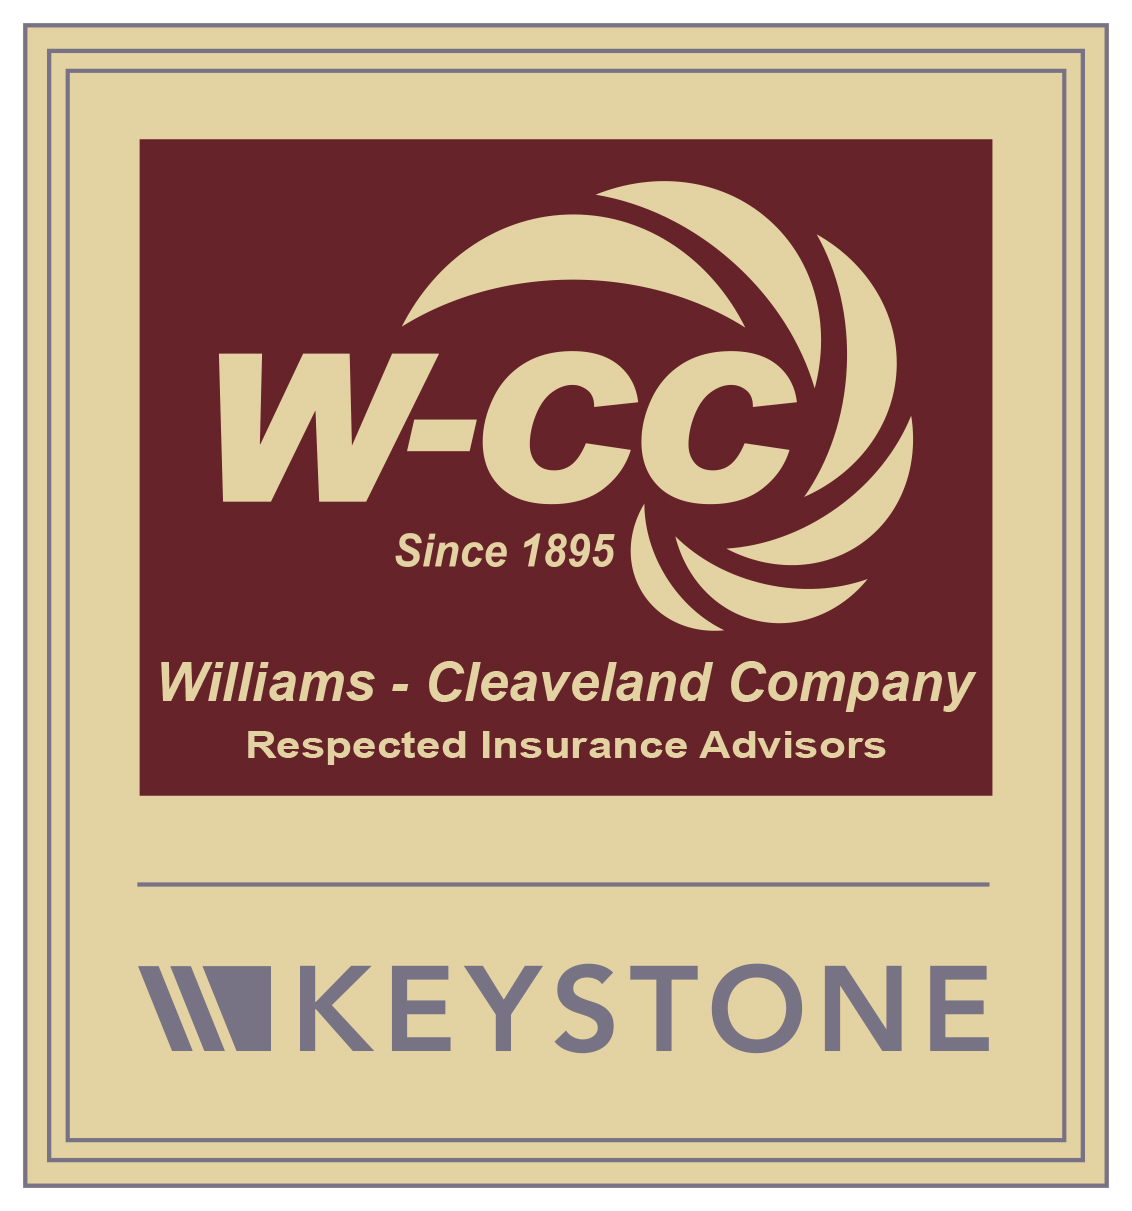 Williams-Cleaveland Company